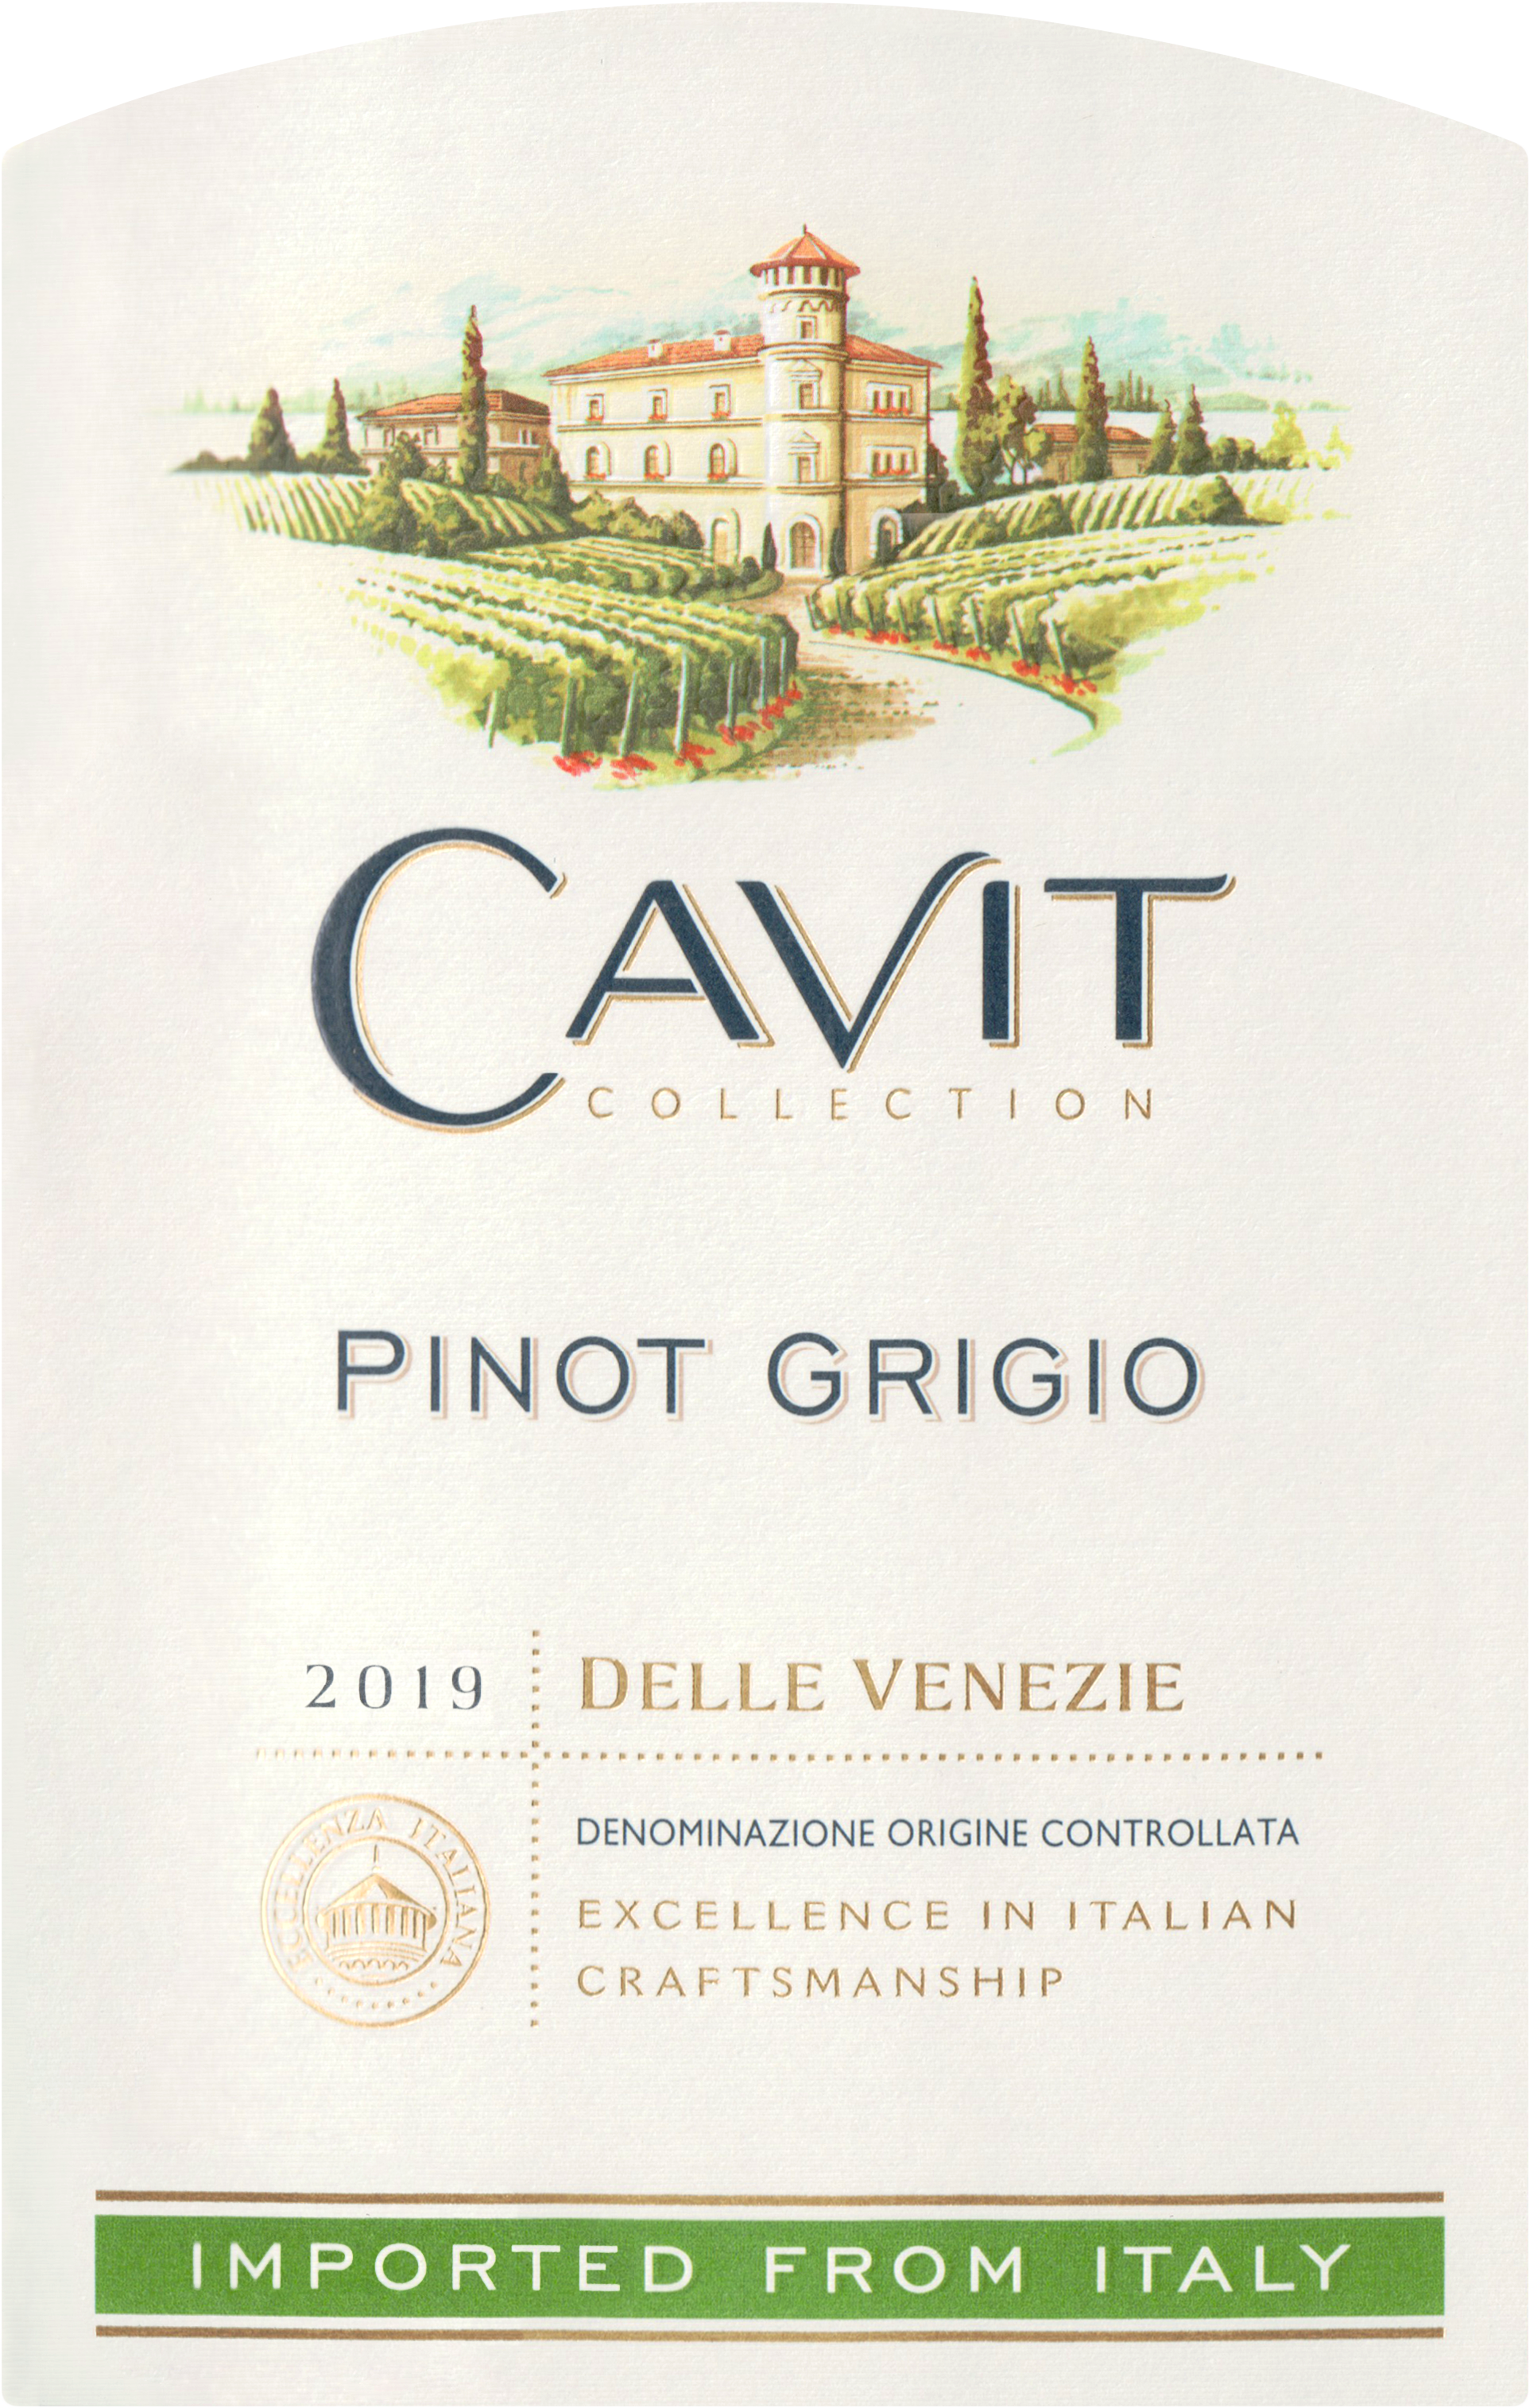 Cavit Pinot Grigio 2019